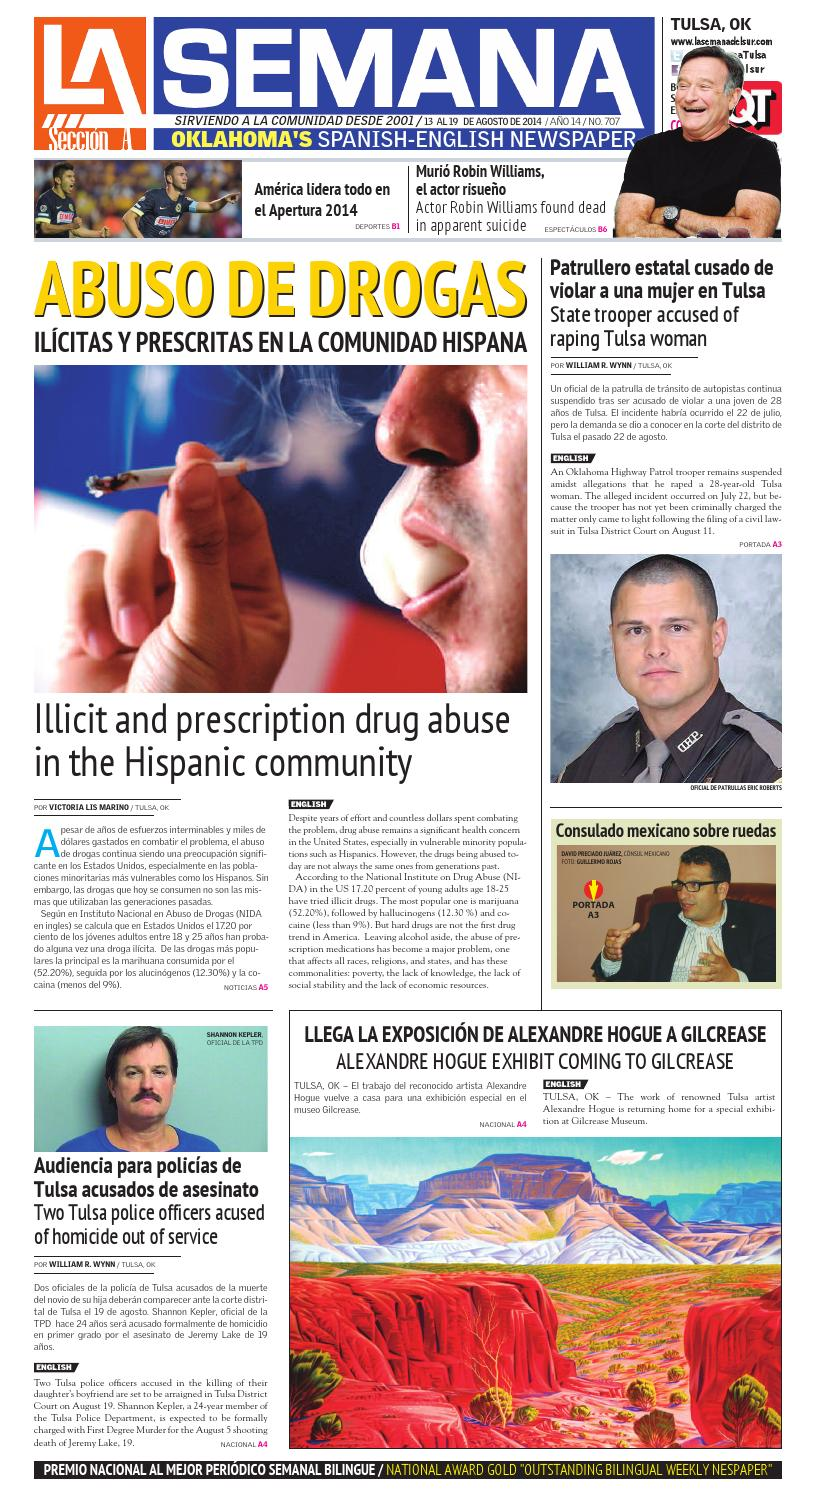 La semana edition 707 august 13 2014 la semana tulsa oklahoma usa by ...